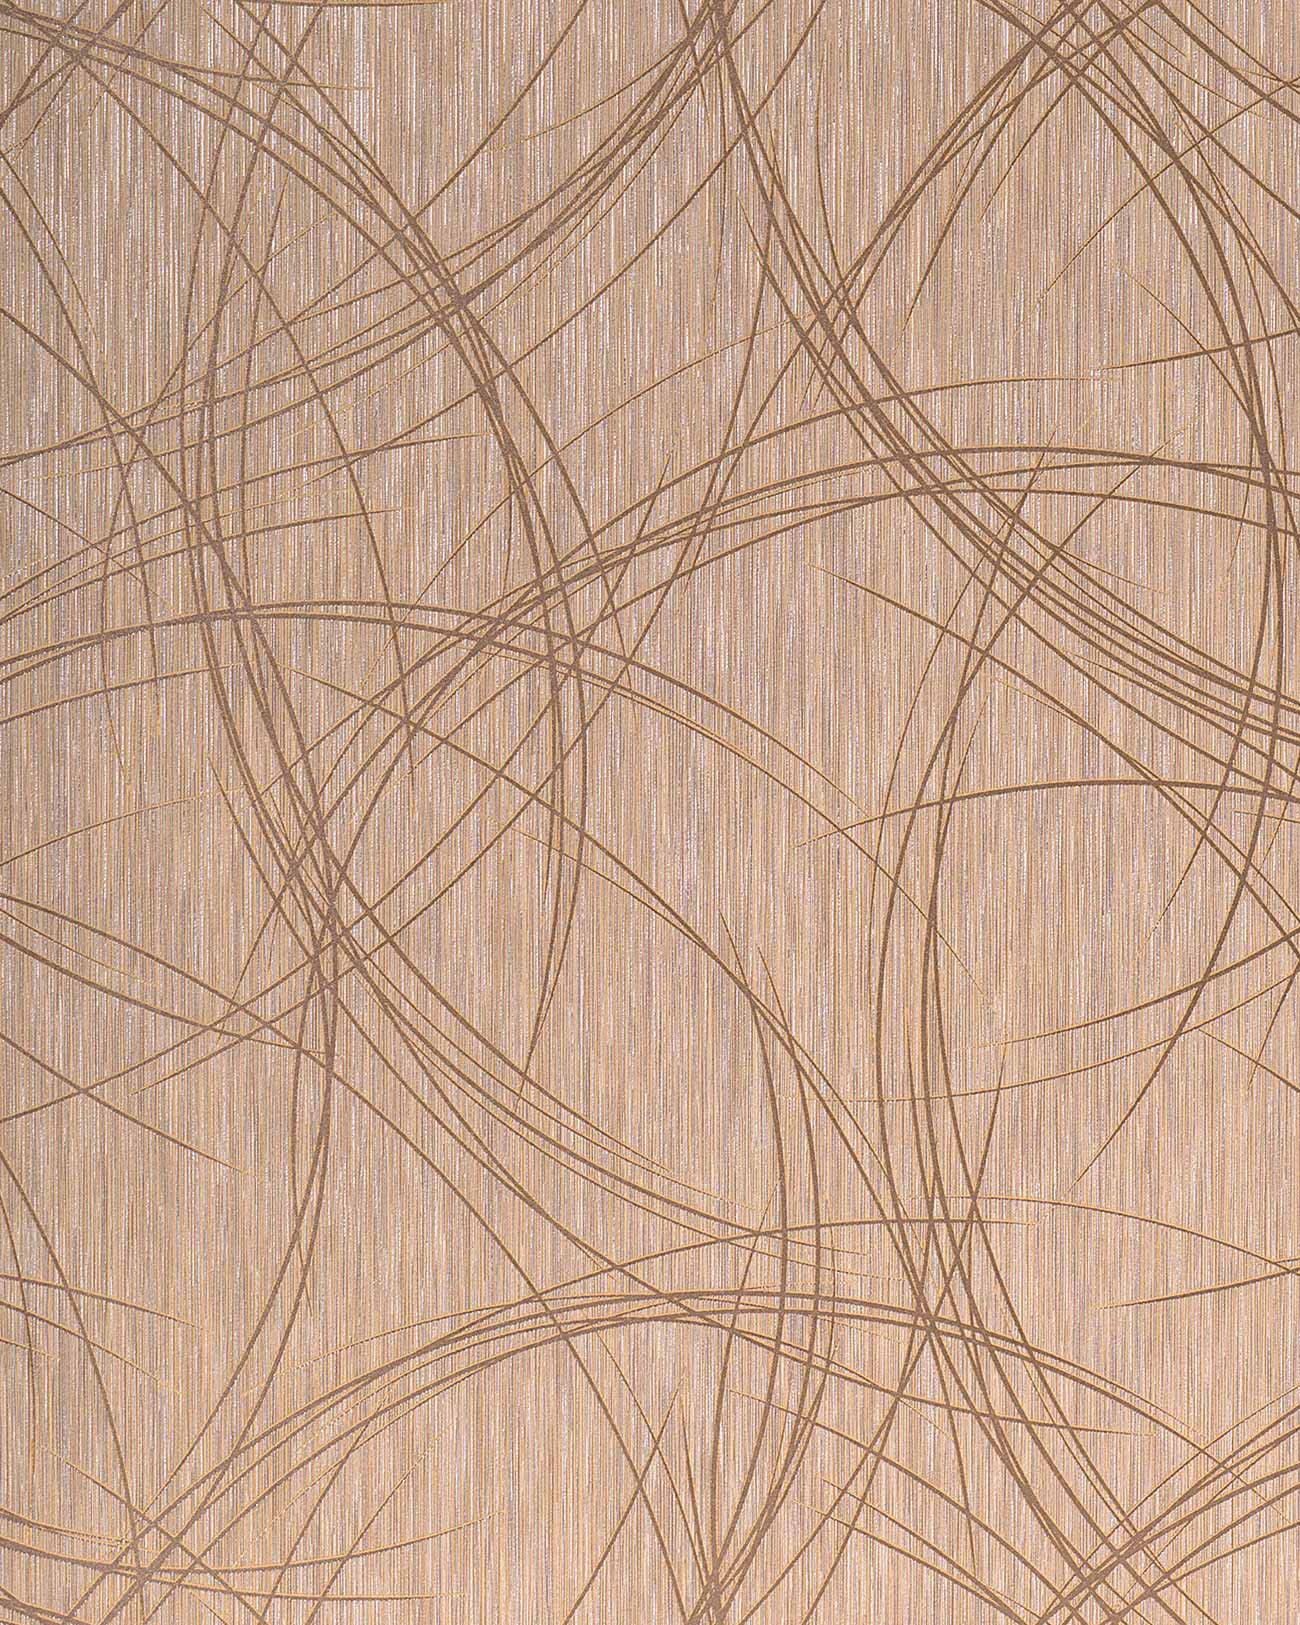 Abwaschbare Tapete Badezimmer : Silver Textured Metallic Wall Coverings